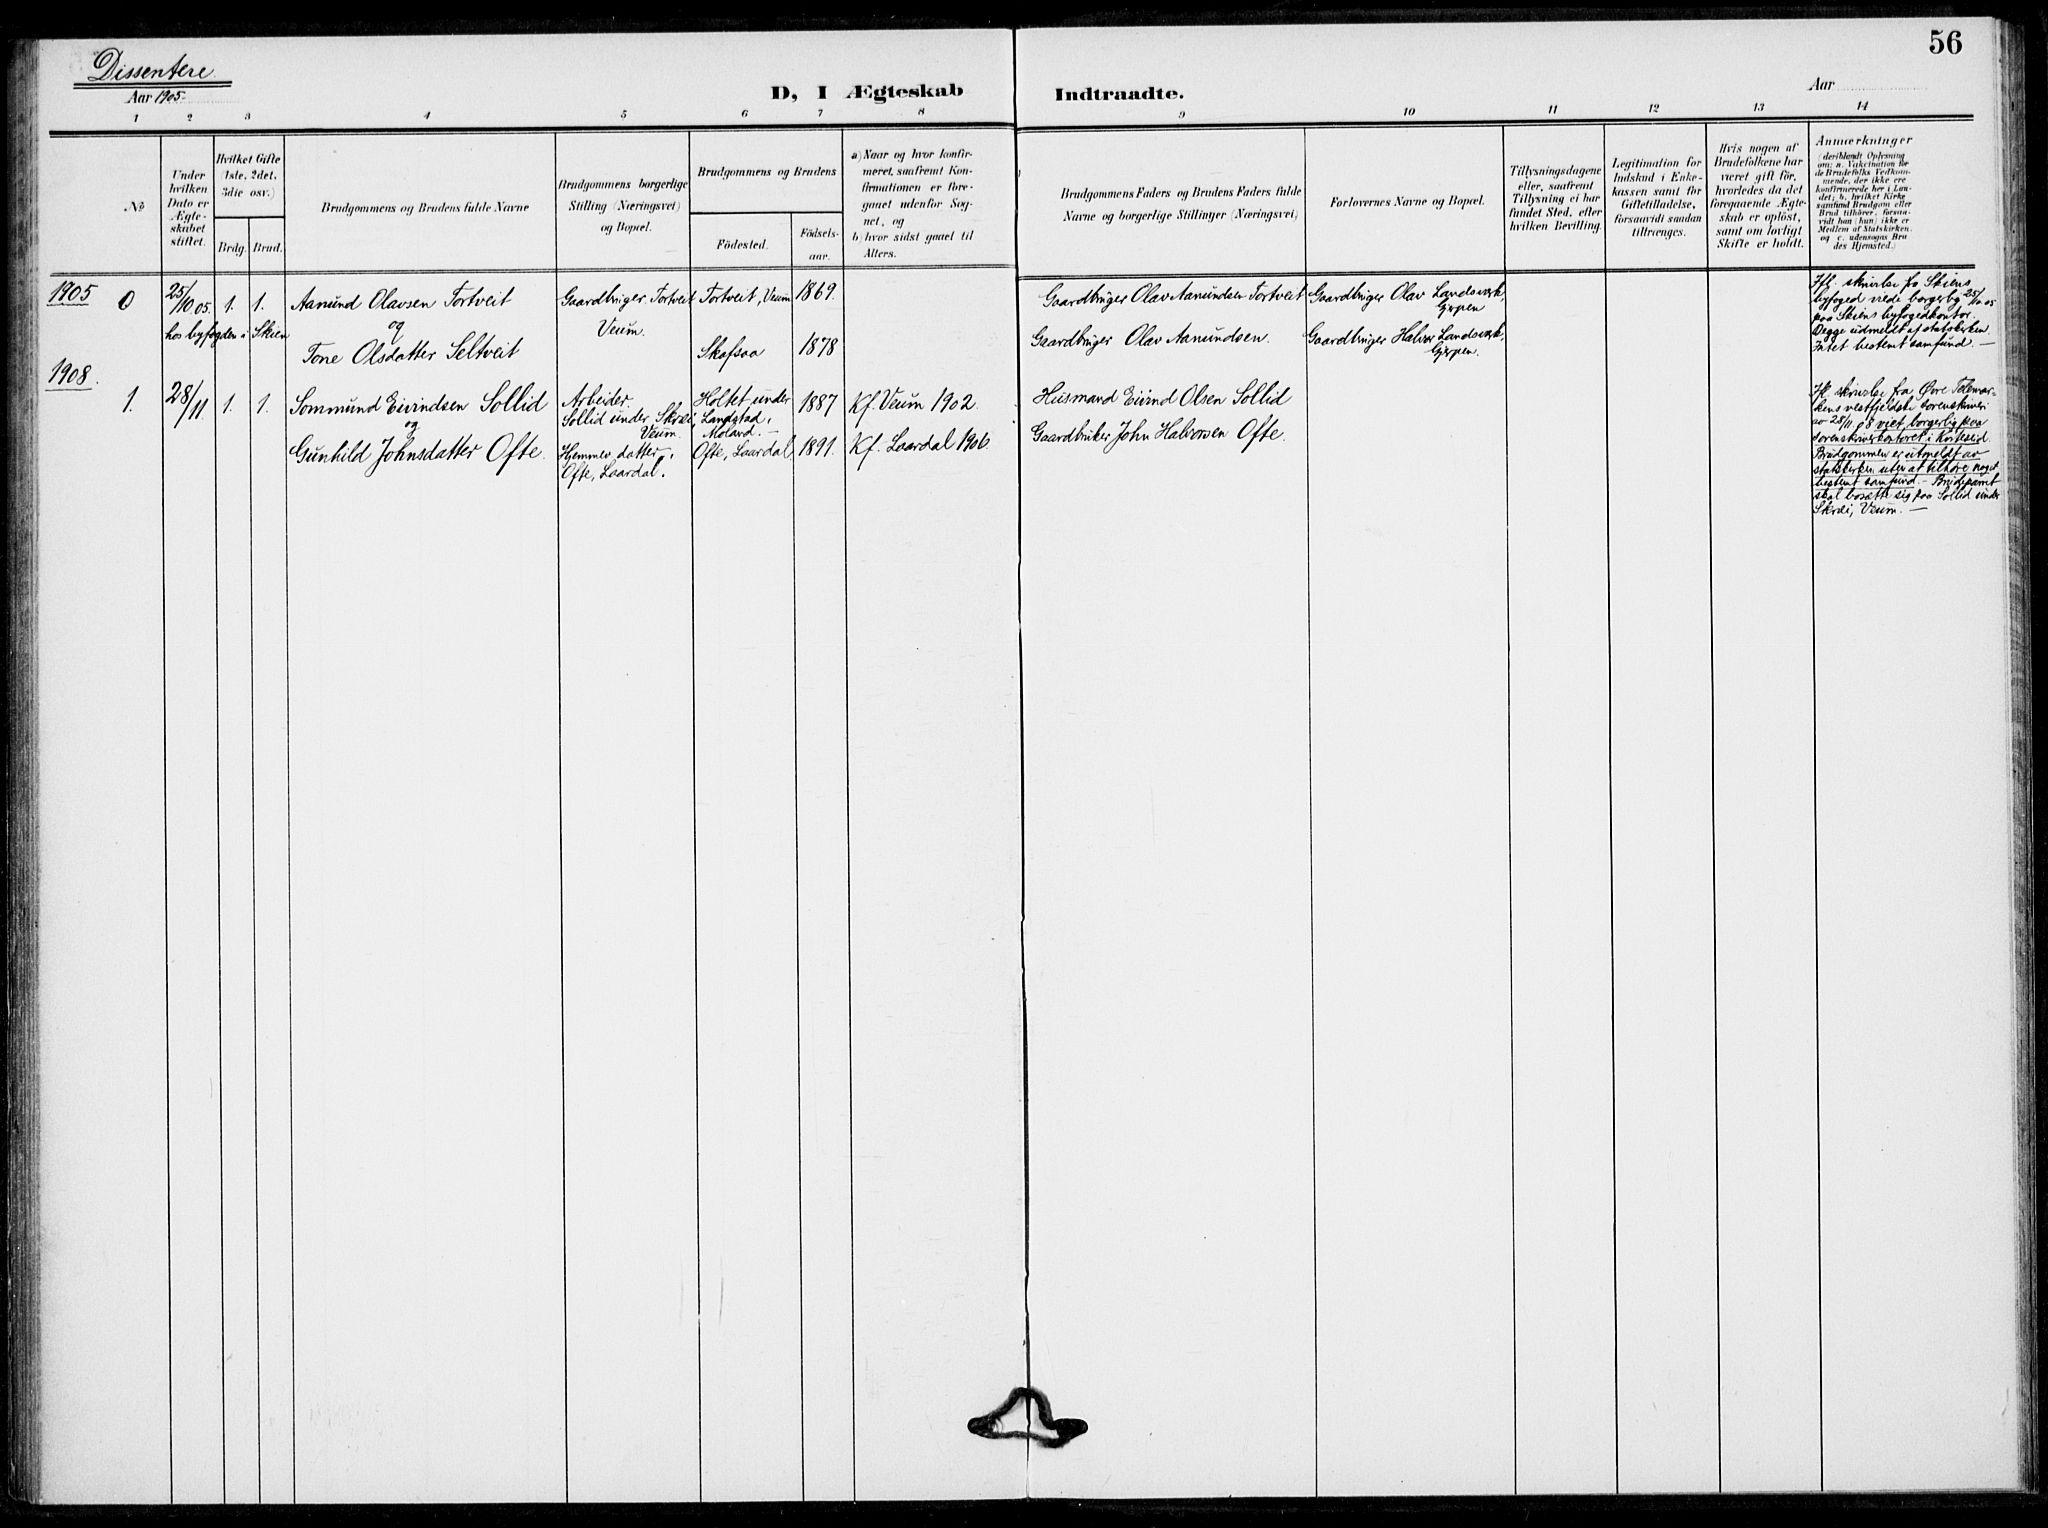 SAKO, Fyresdal kirkebøker, F/Fb/L0004: Parish register (official) no. II 4, 1903-1920, p. 56